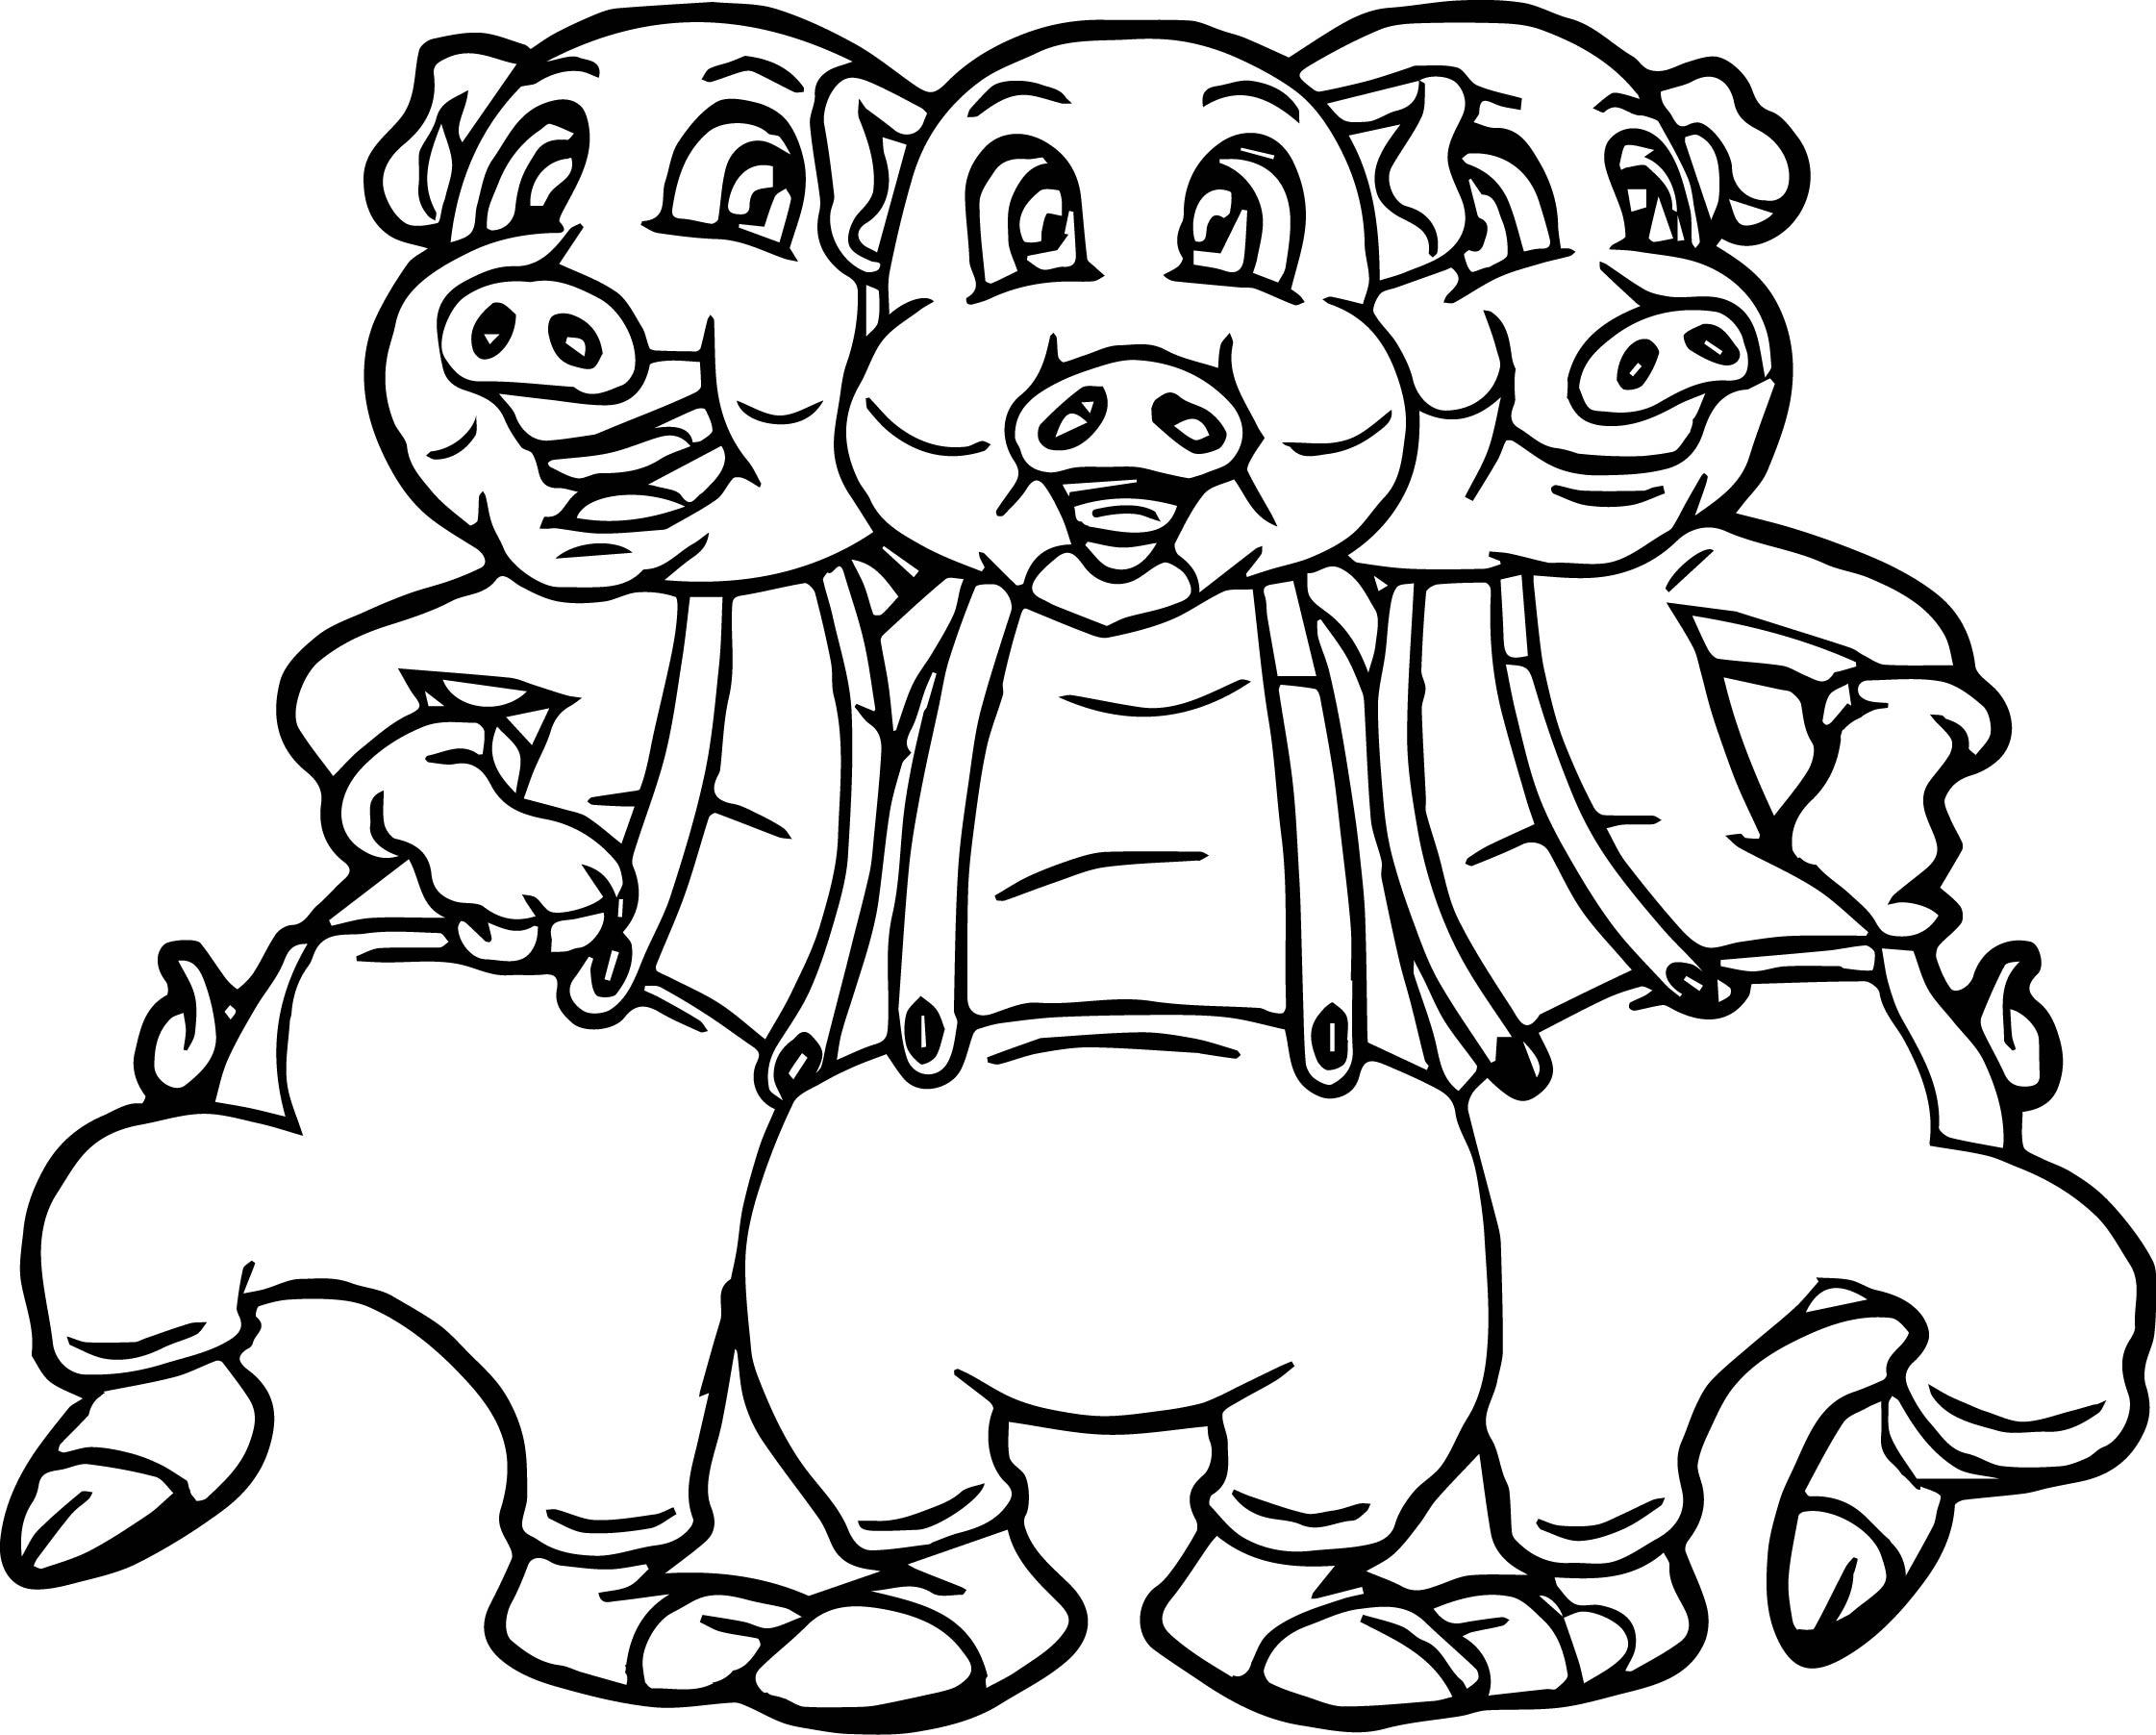 2242x1804 Three Little Pigs Dancing Coloring Page Coloringsuitecom, Dancing